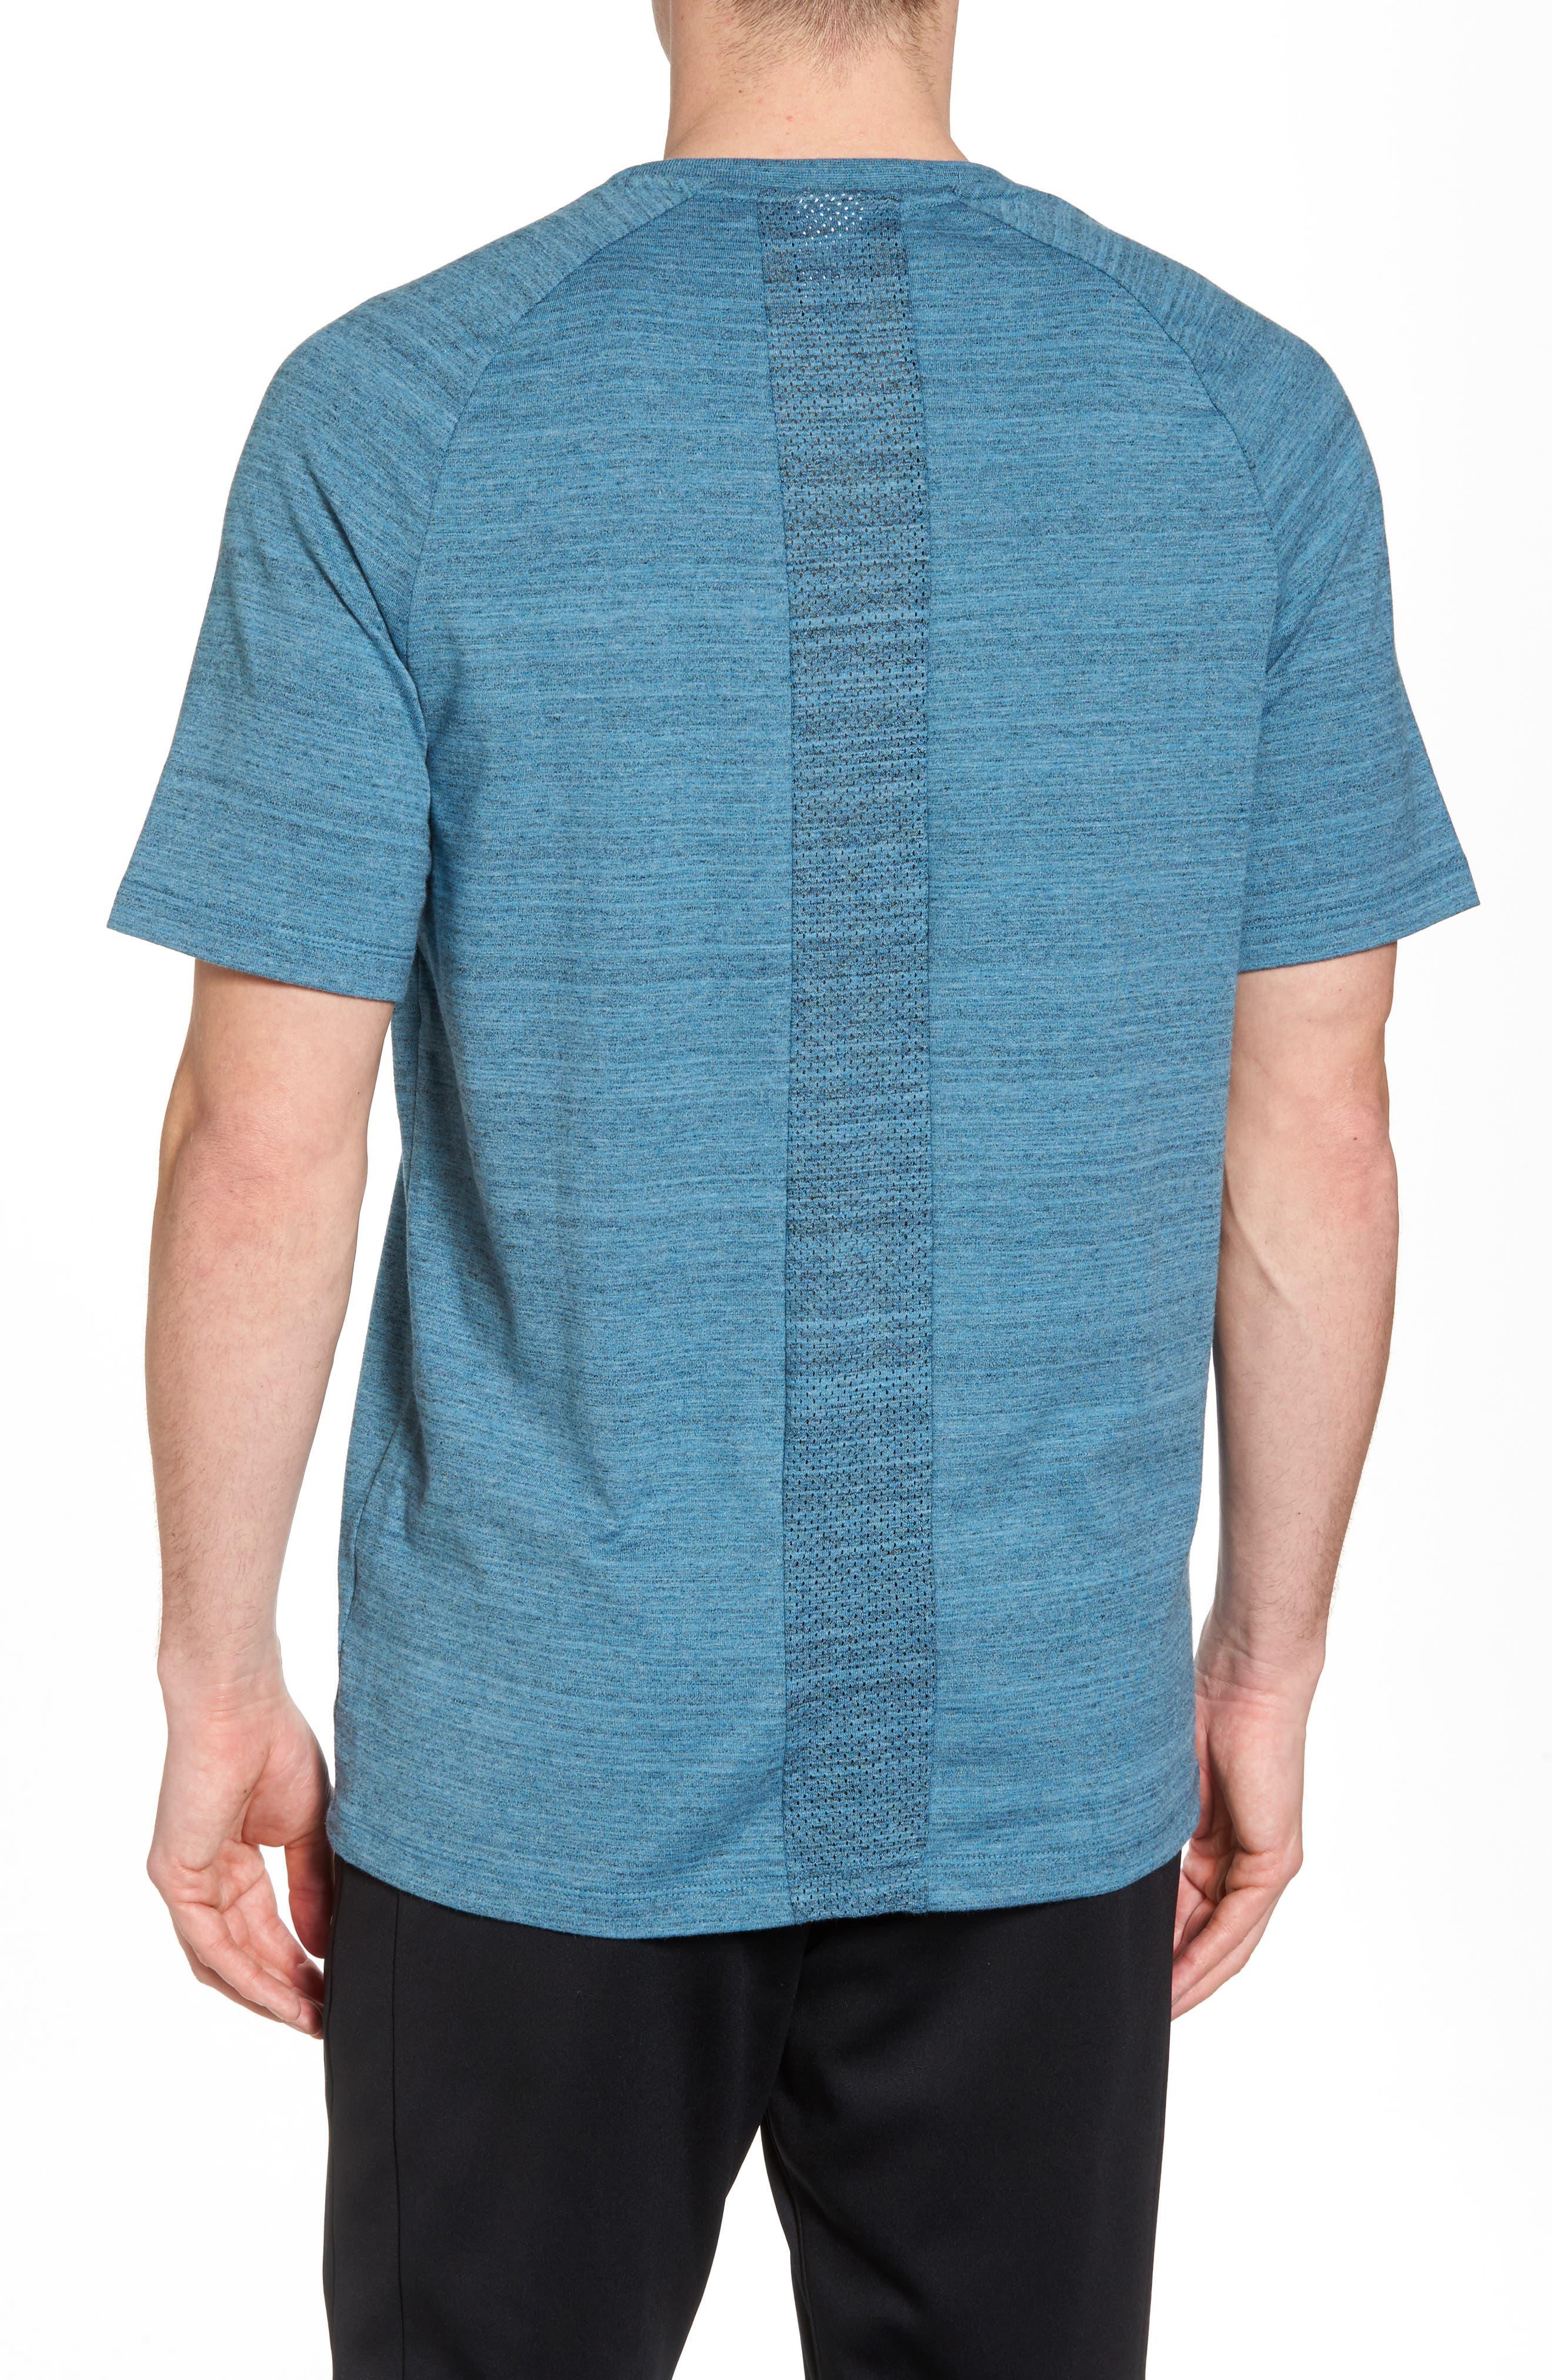 NSW AV15 Crewneck T-Shirt,                             Alternate thumbnail 2, color,                             NOISE AQUA/ HEATHER/ WHITE